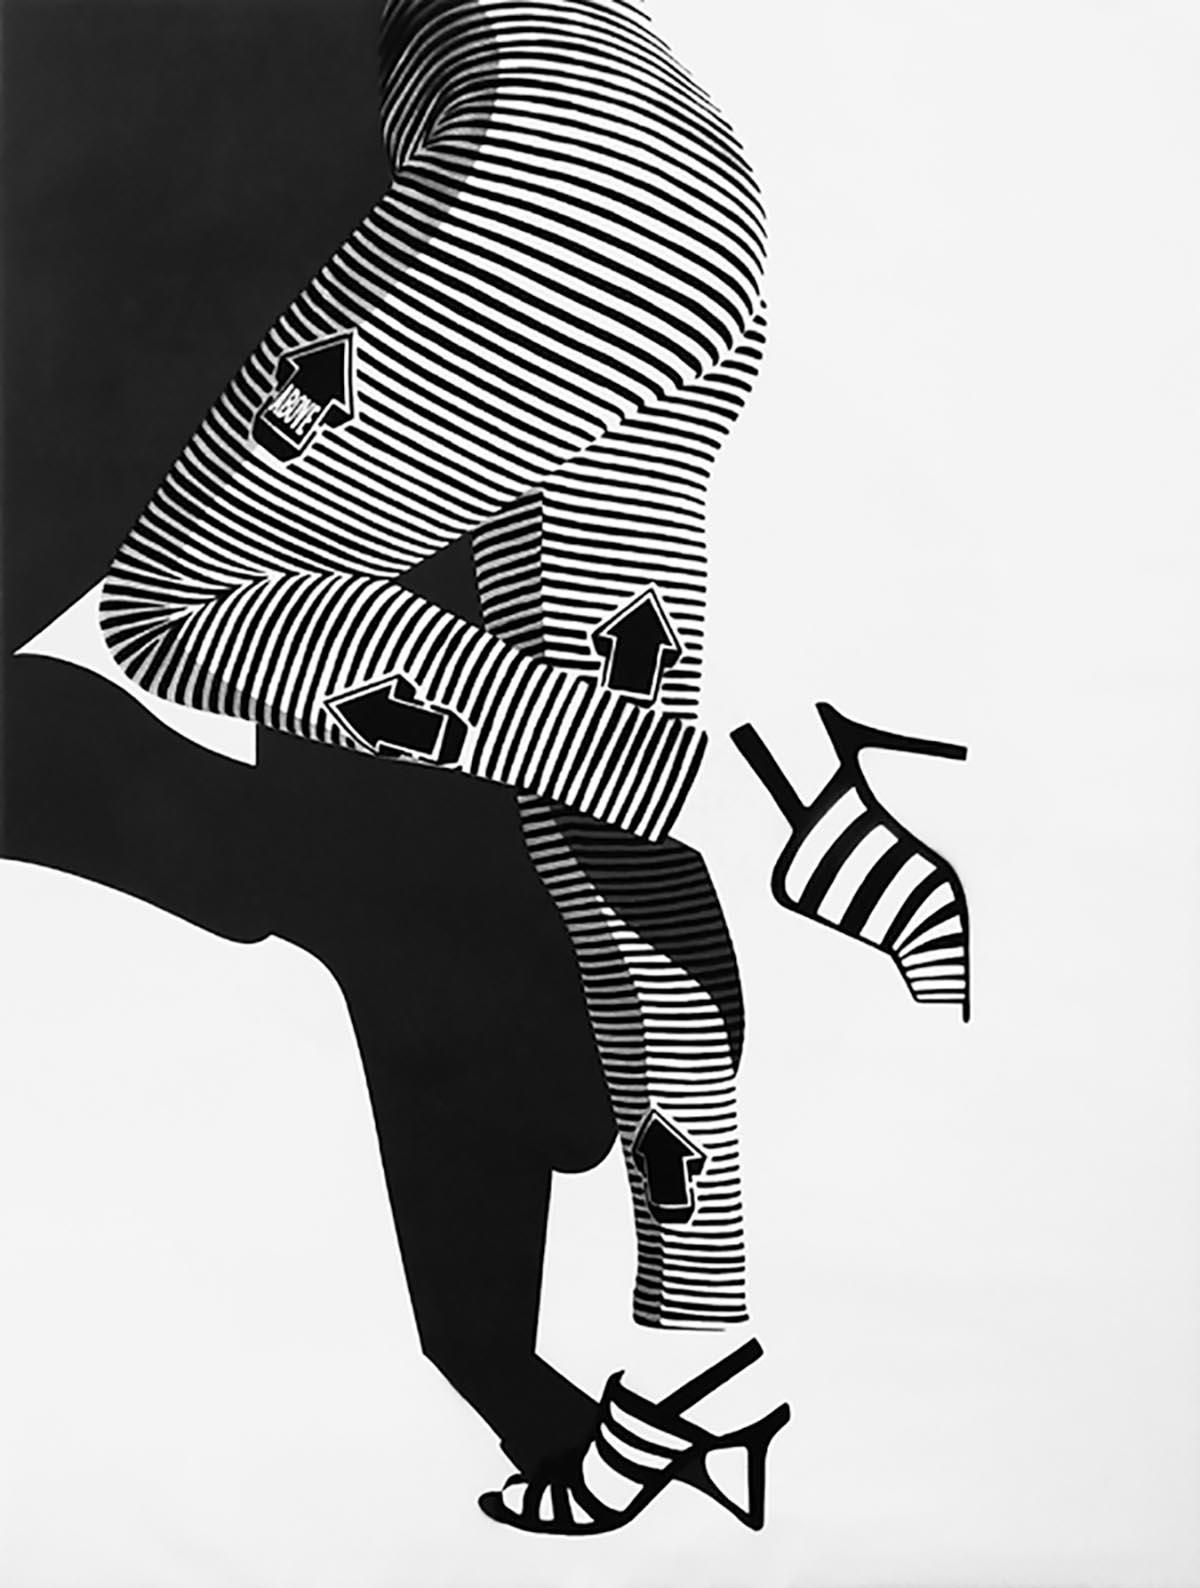 ABOVE Ophelia (legs) Spray enamel on canvas, 2015 47 x 35.5 in